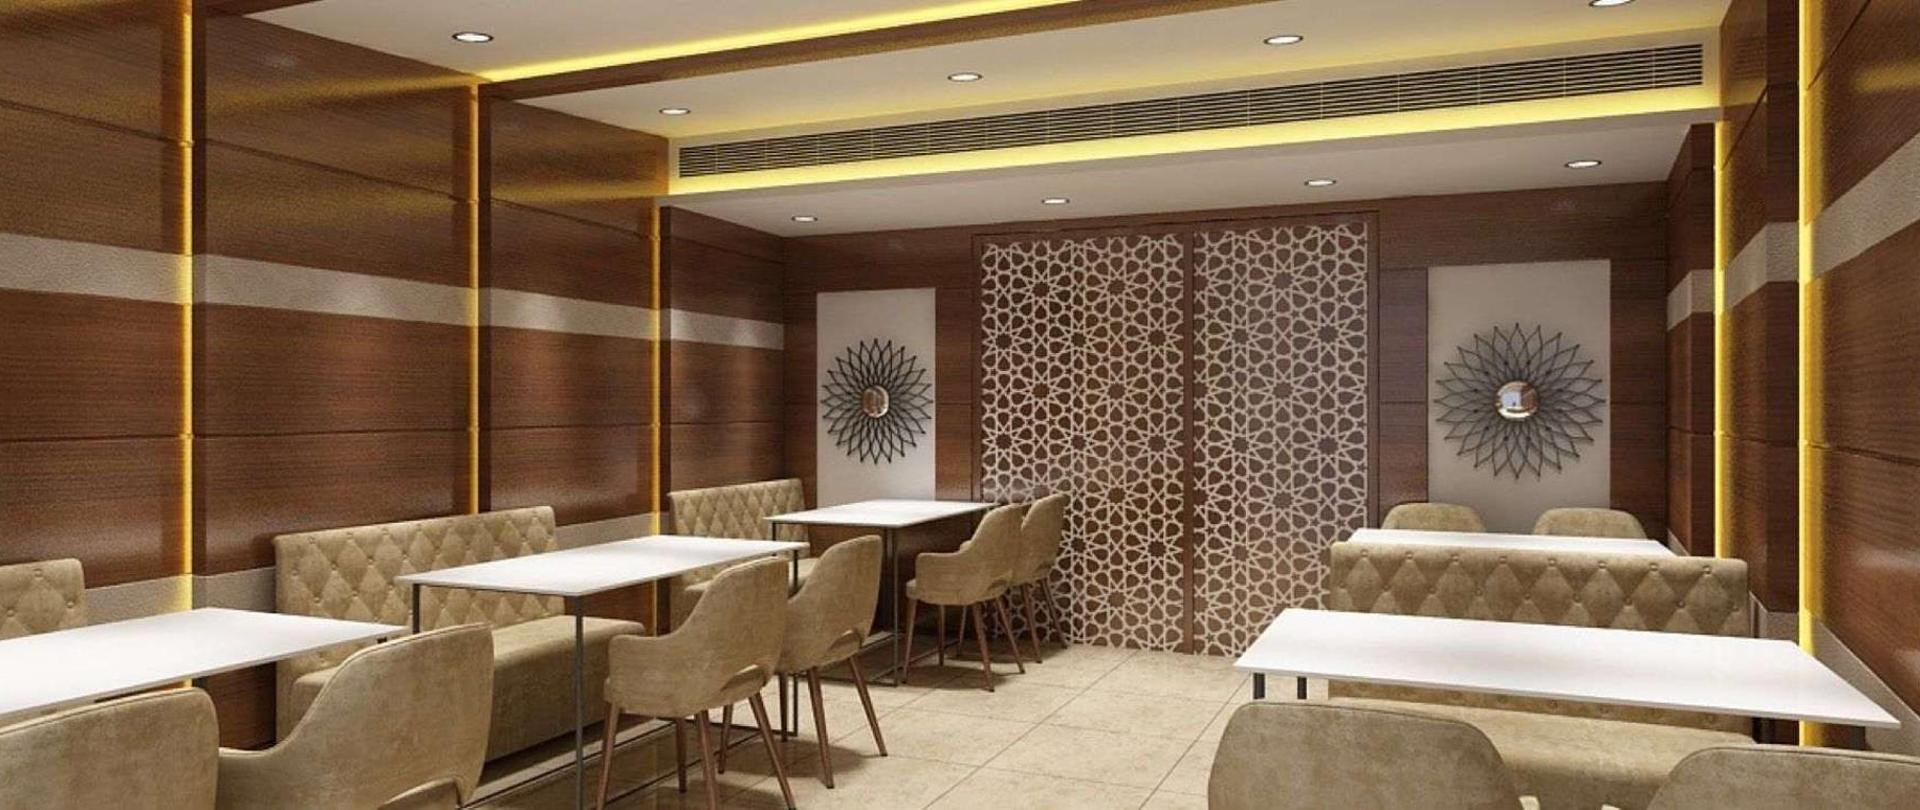 grand-ffour-dinning-room-1.jpg